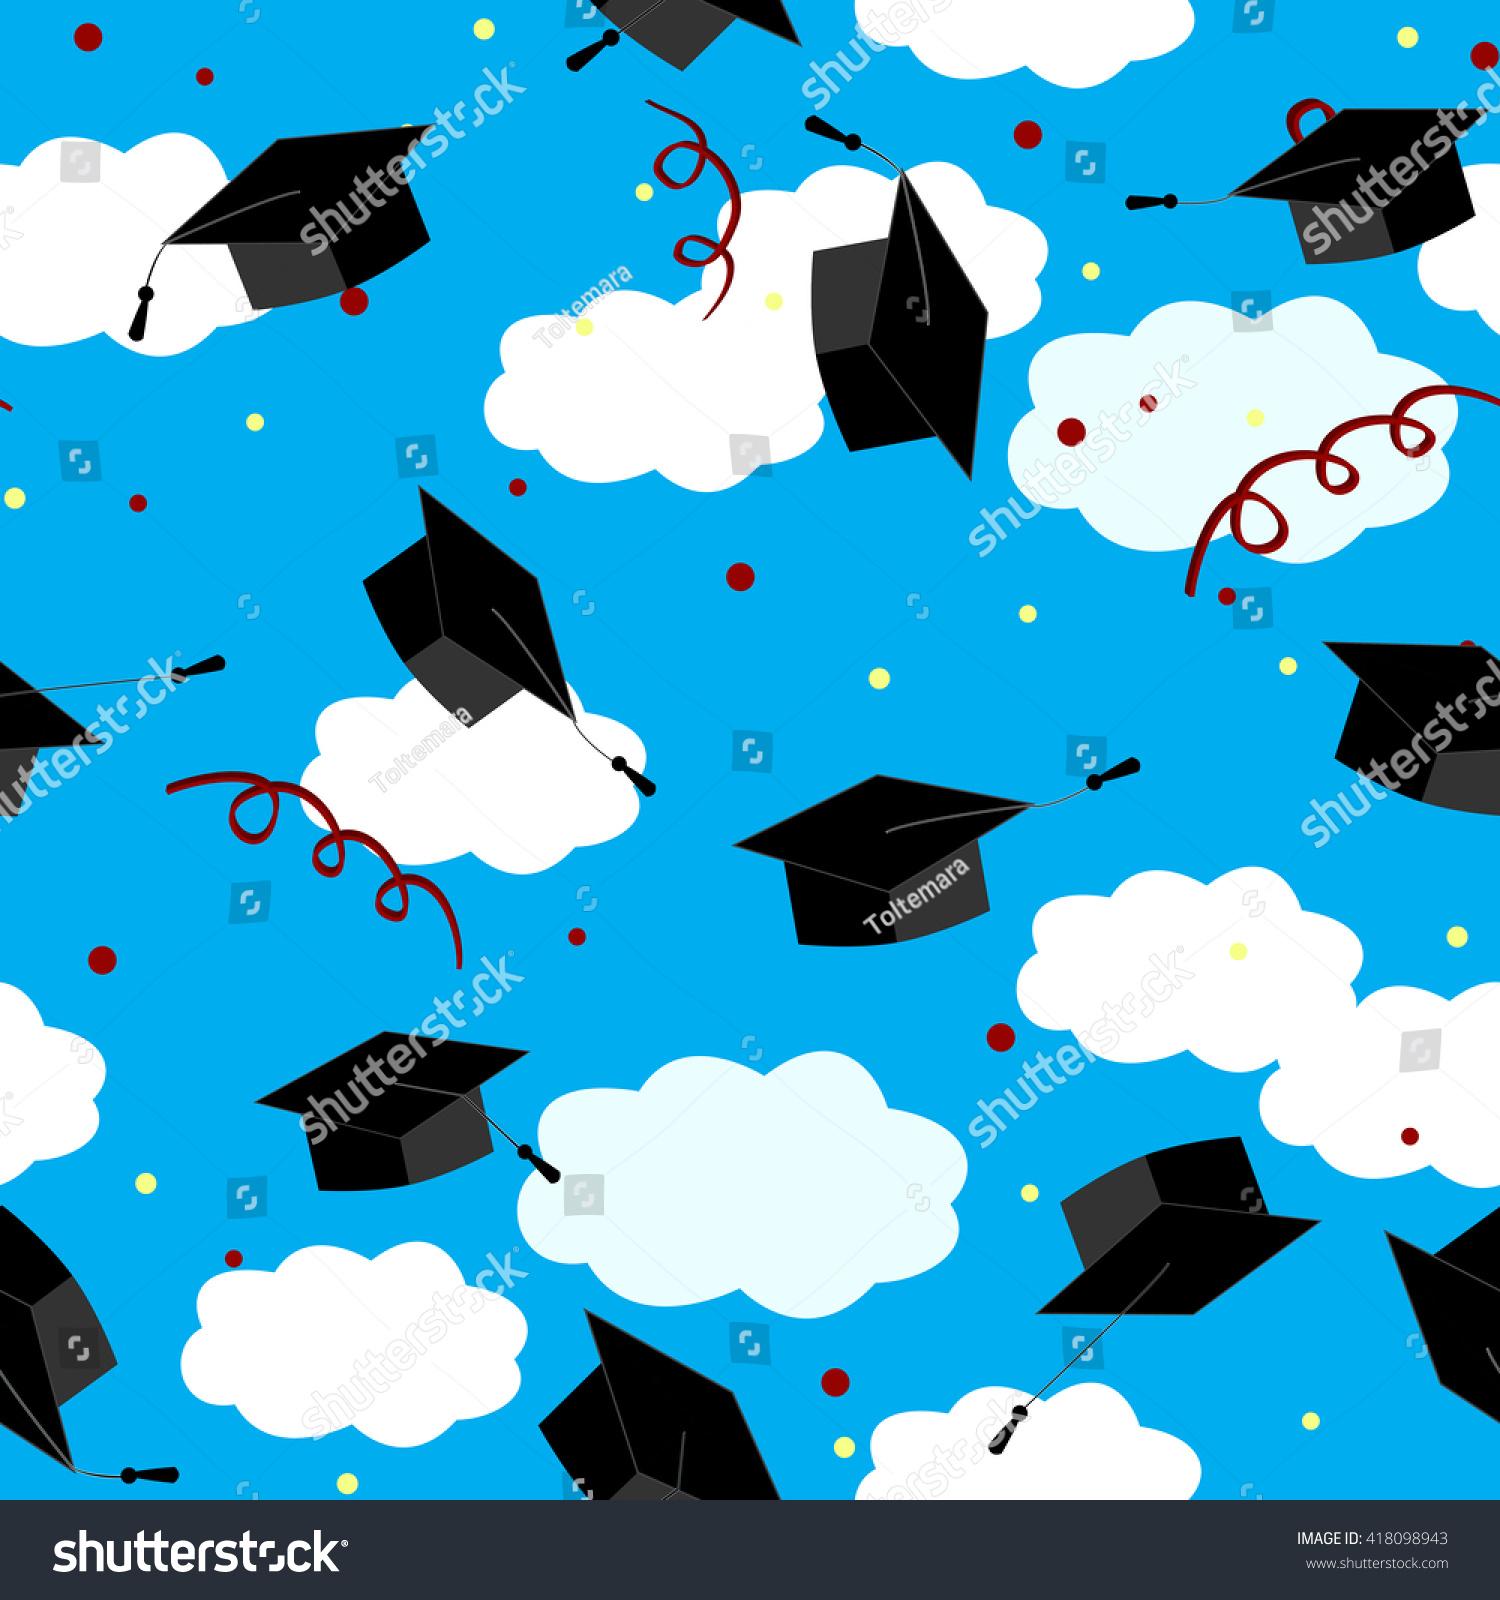 free graduation university backgrounds - photo #37